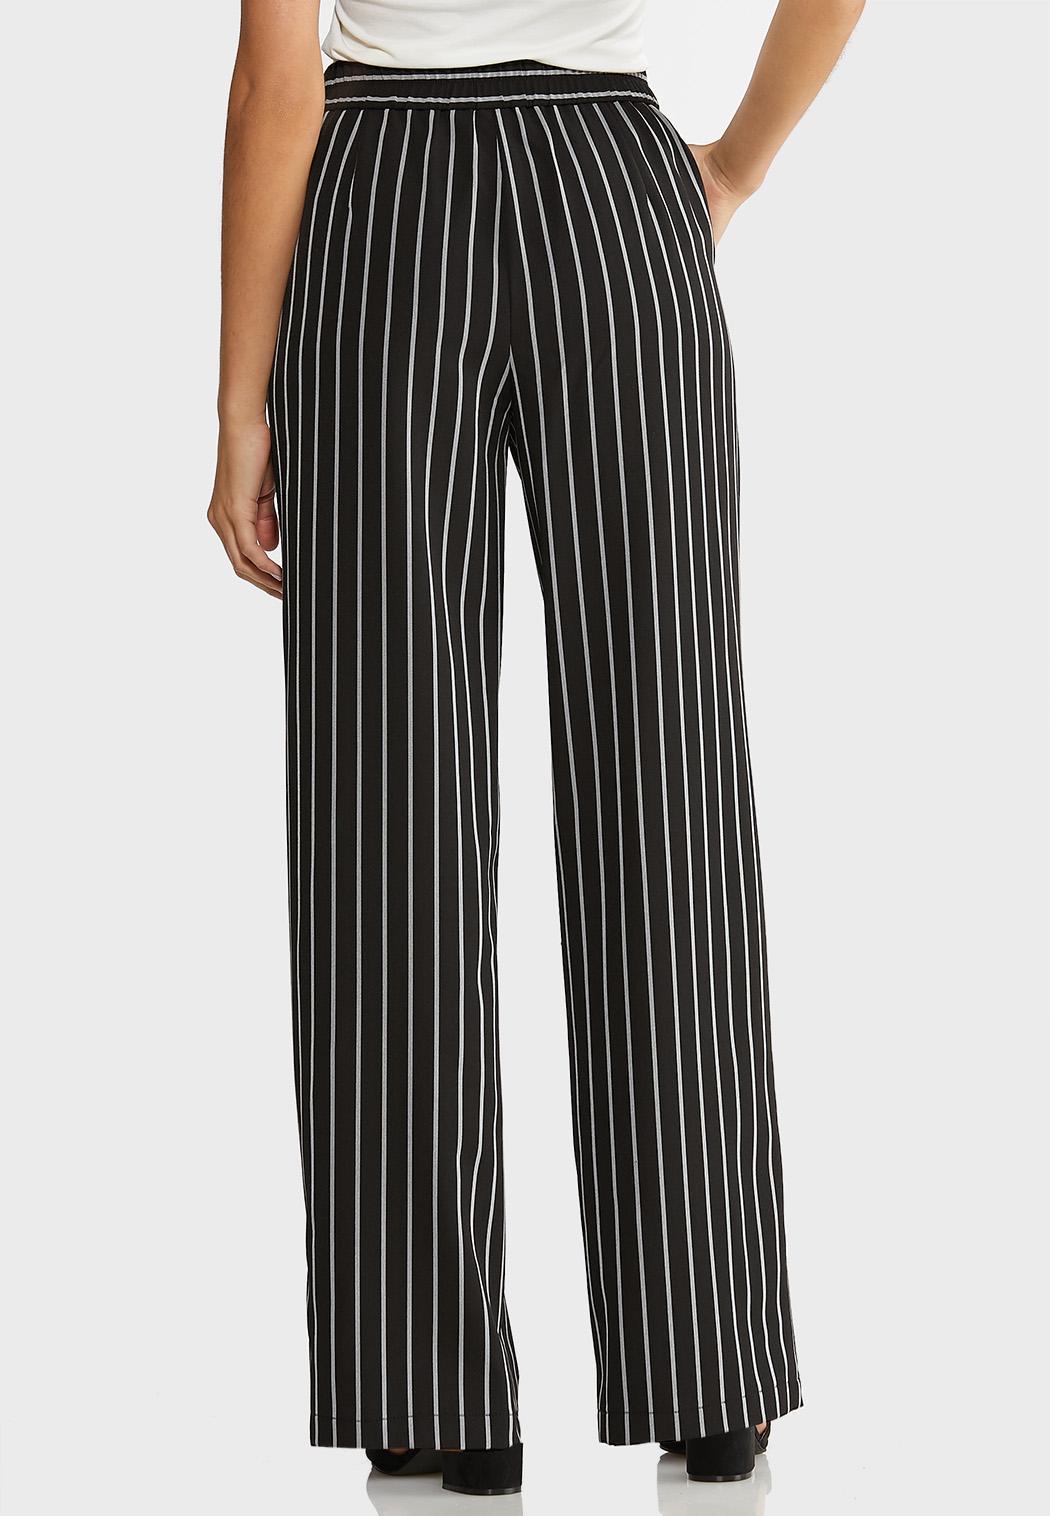 Belted Wide Leg Pants (Item #43927058)